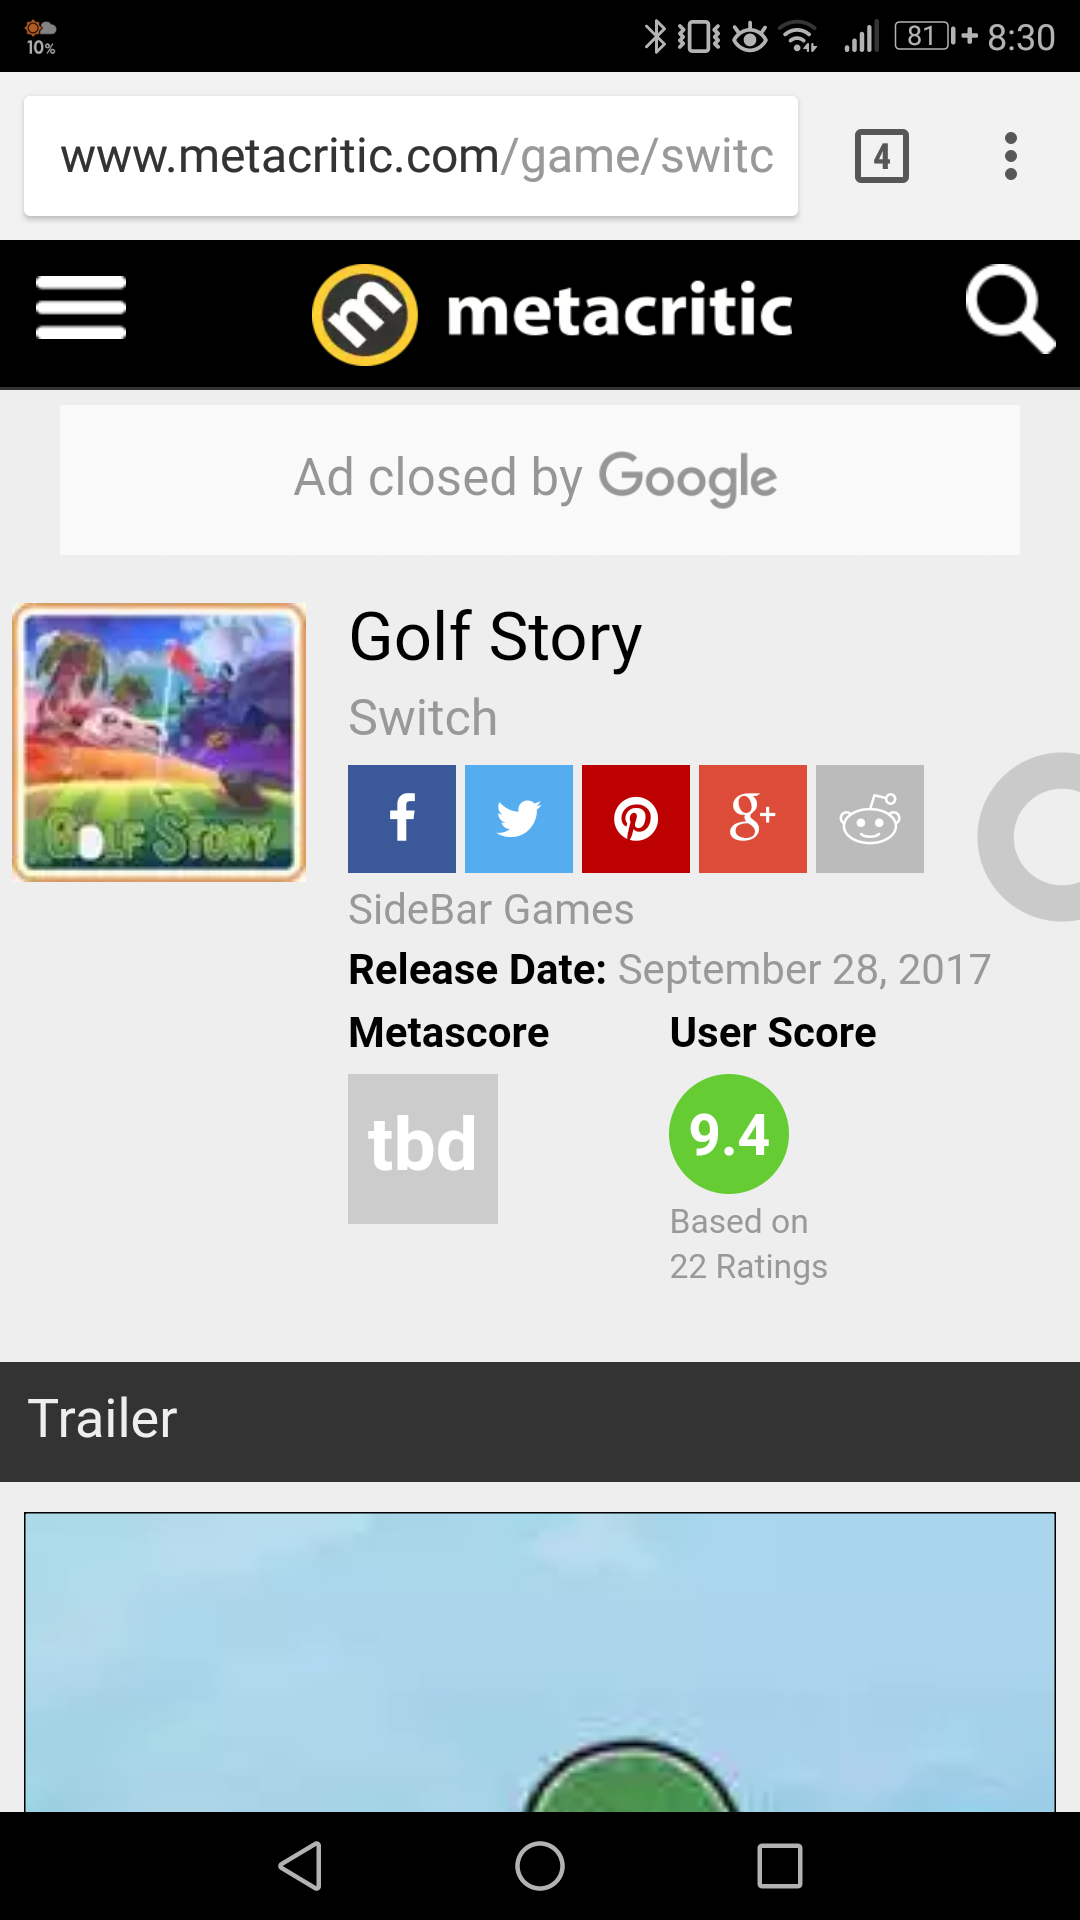 2GEaTe304UbaB - 【朗報】Switch独占のゴルフストーリー、ユーザースコアはなんと脅威の9.4!